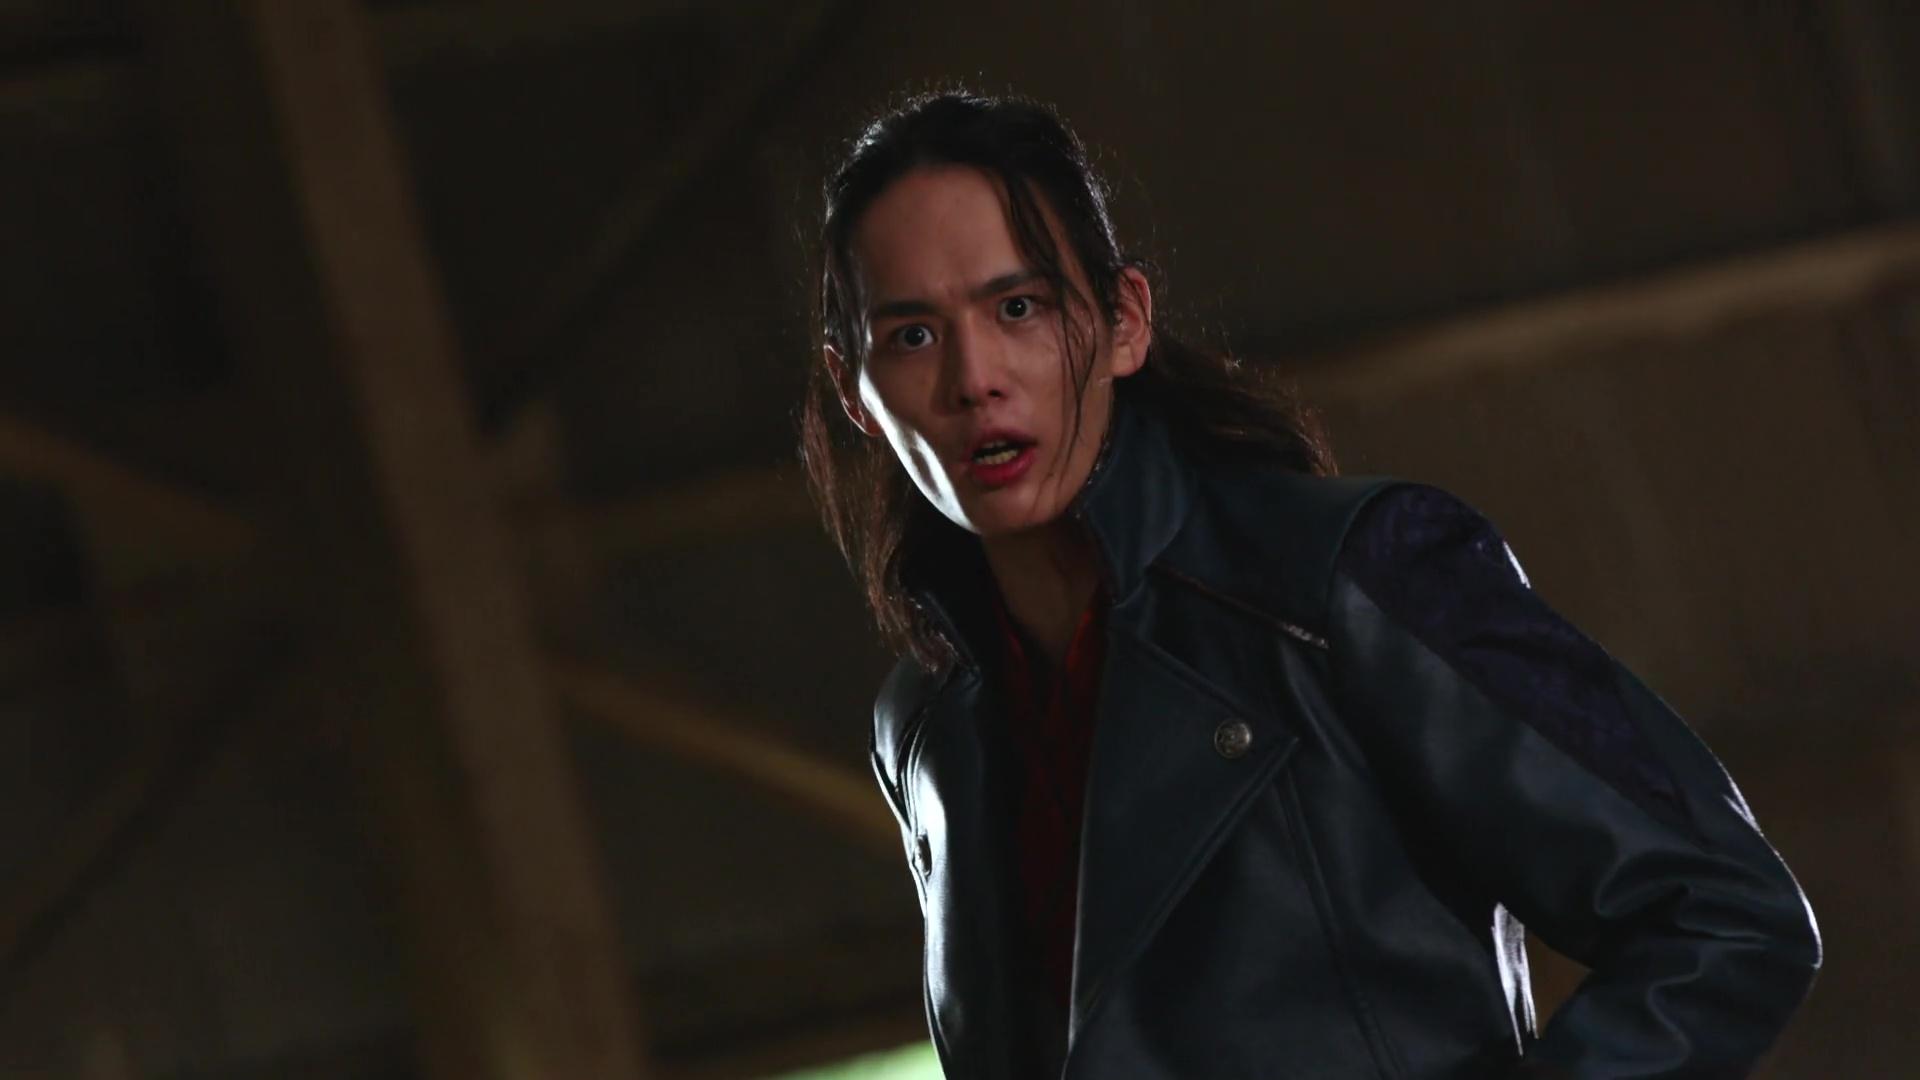 Kamen Rider Saber Episode 10 Recap